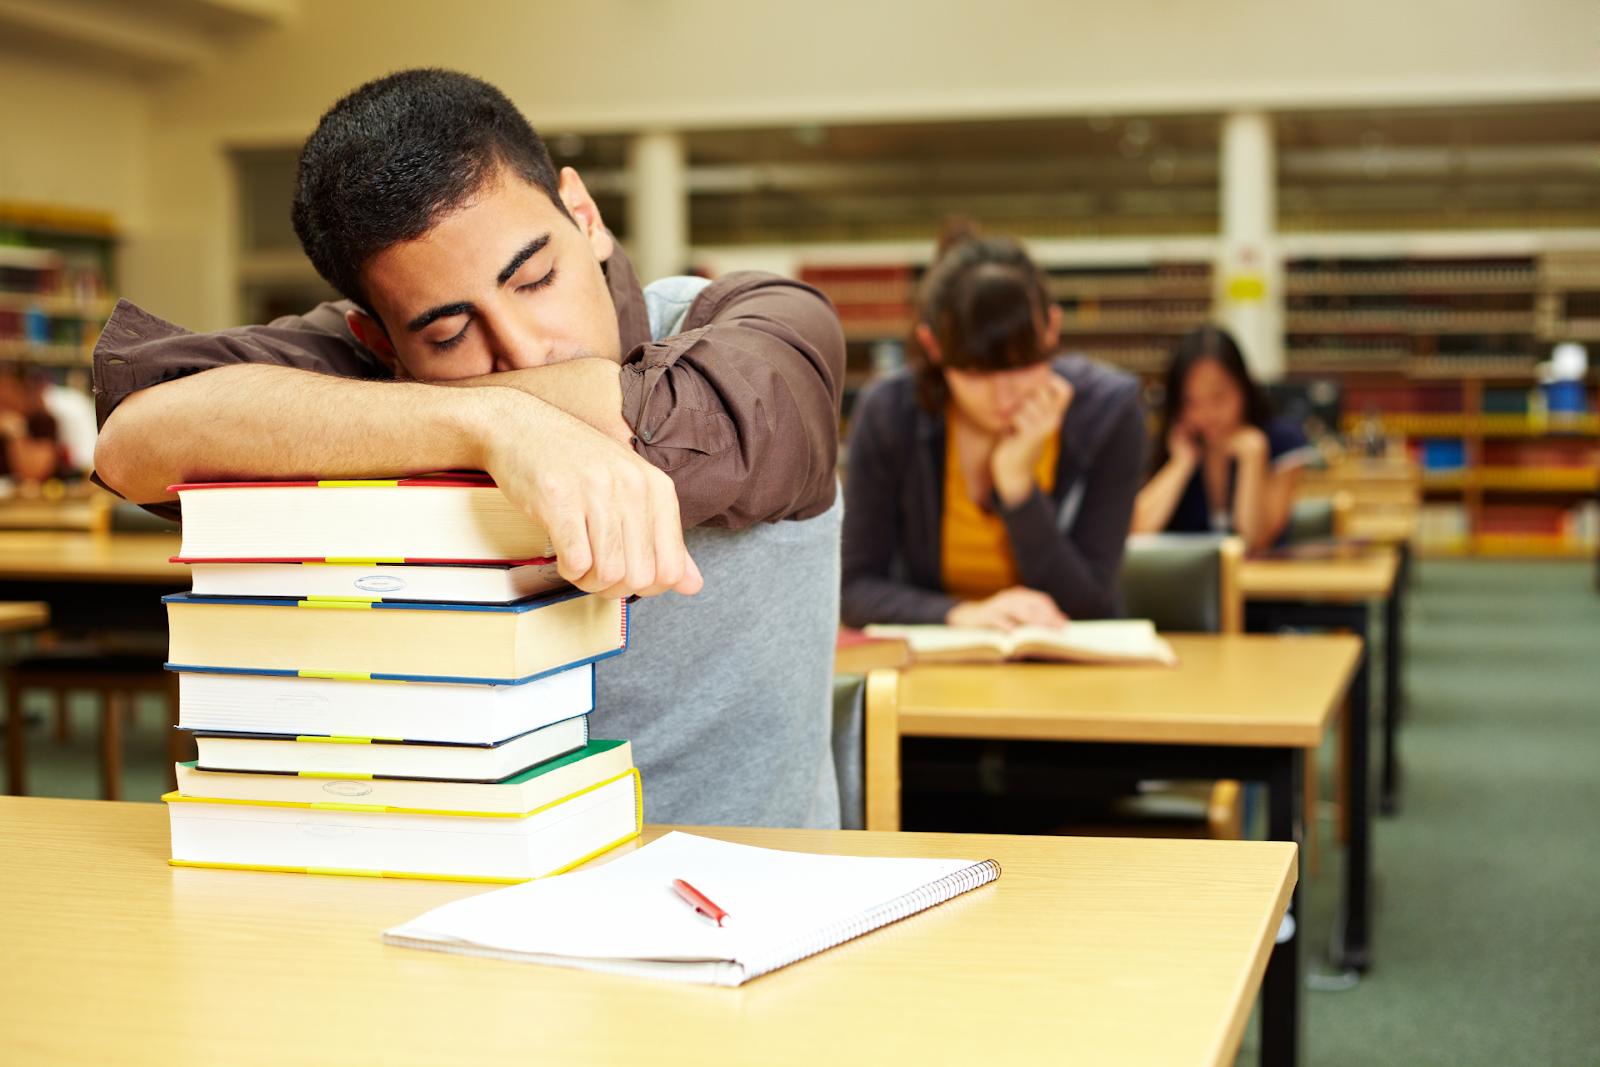 college student falling asleep on textbooks